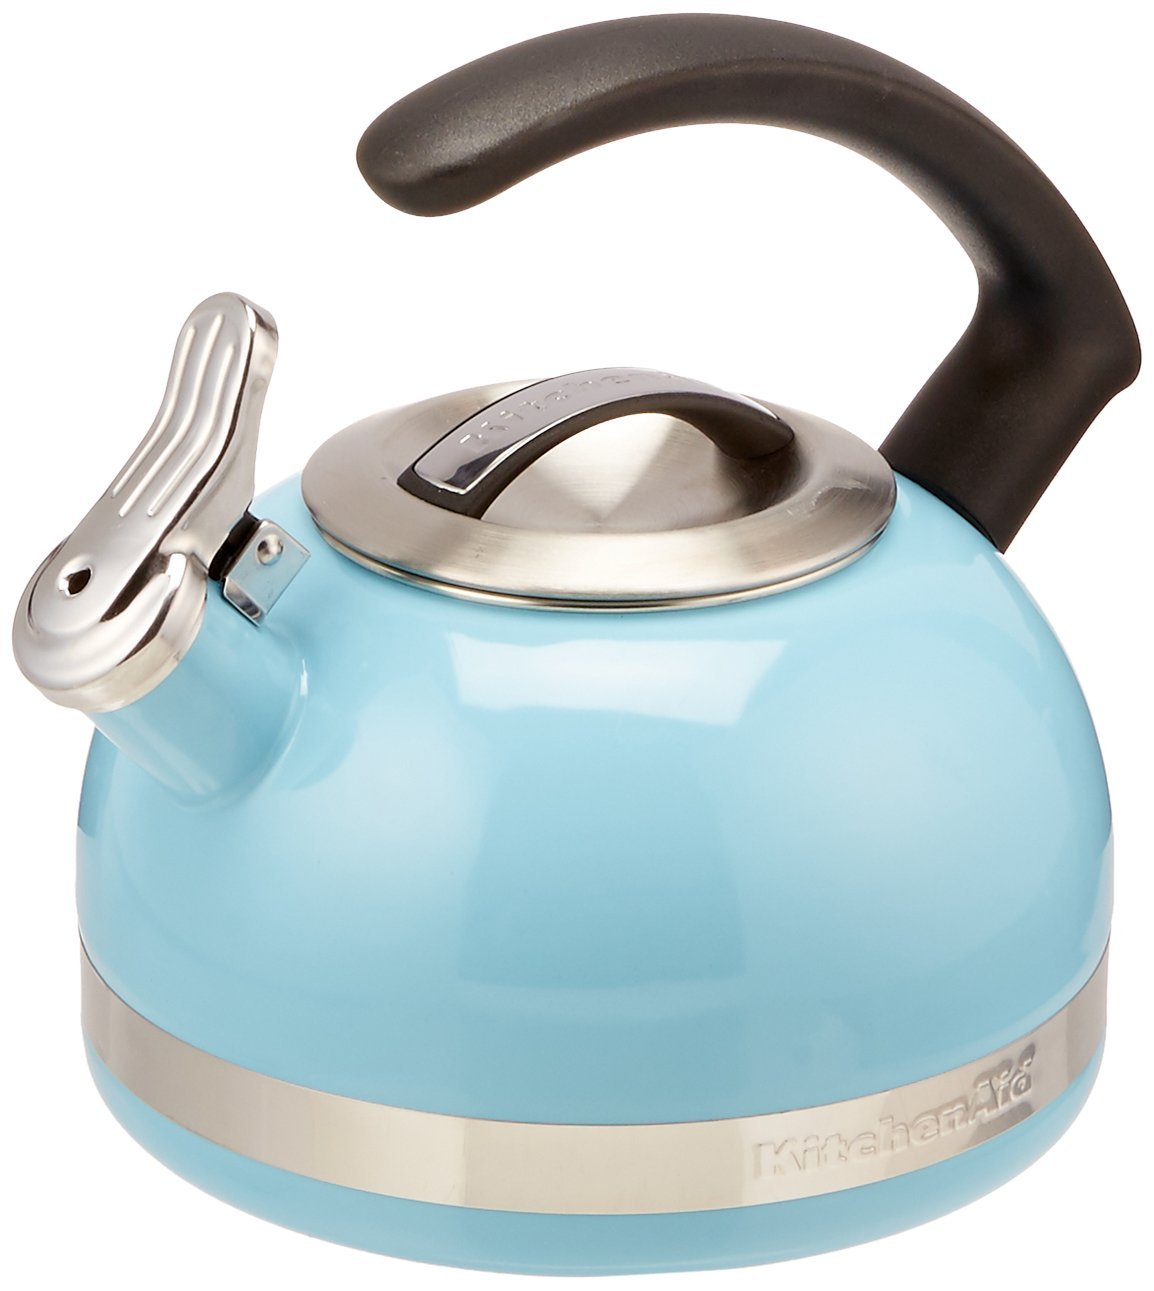 KitchenAid KTEN20CBEU 2.0-Quart Kettle with C Handle and Trim Band - Cameo Blue